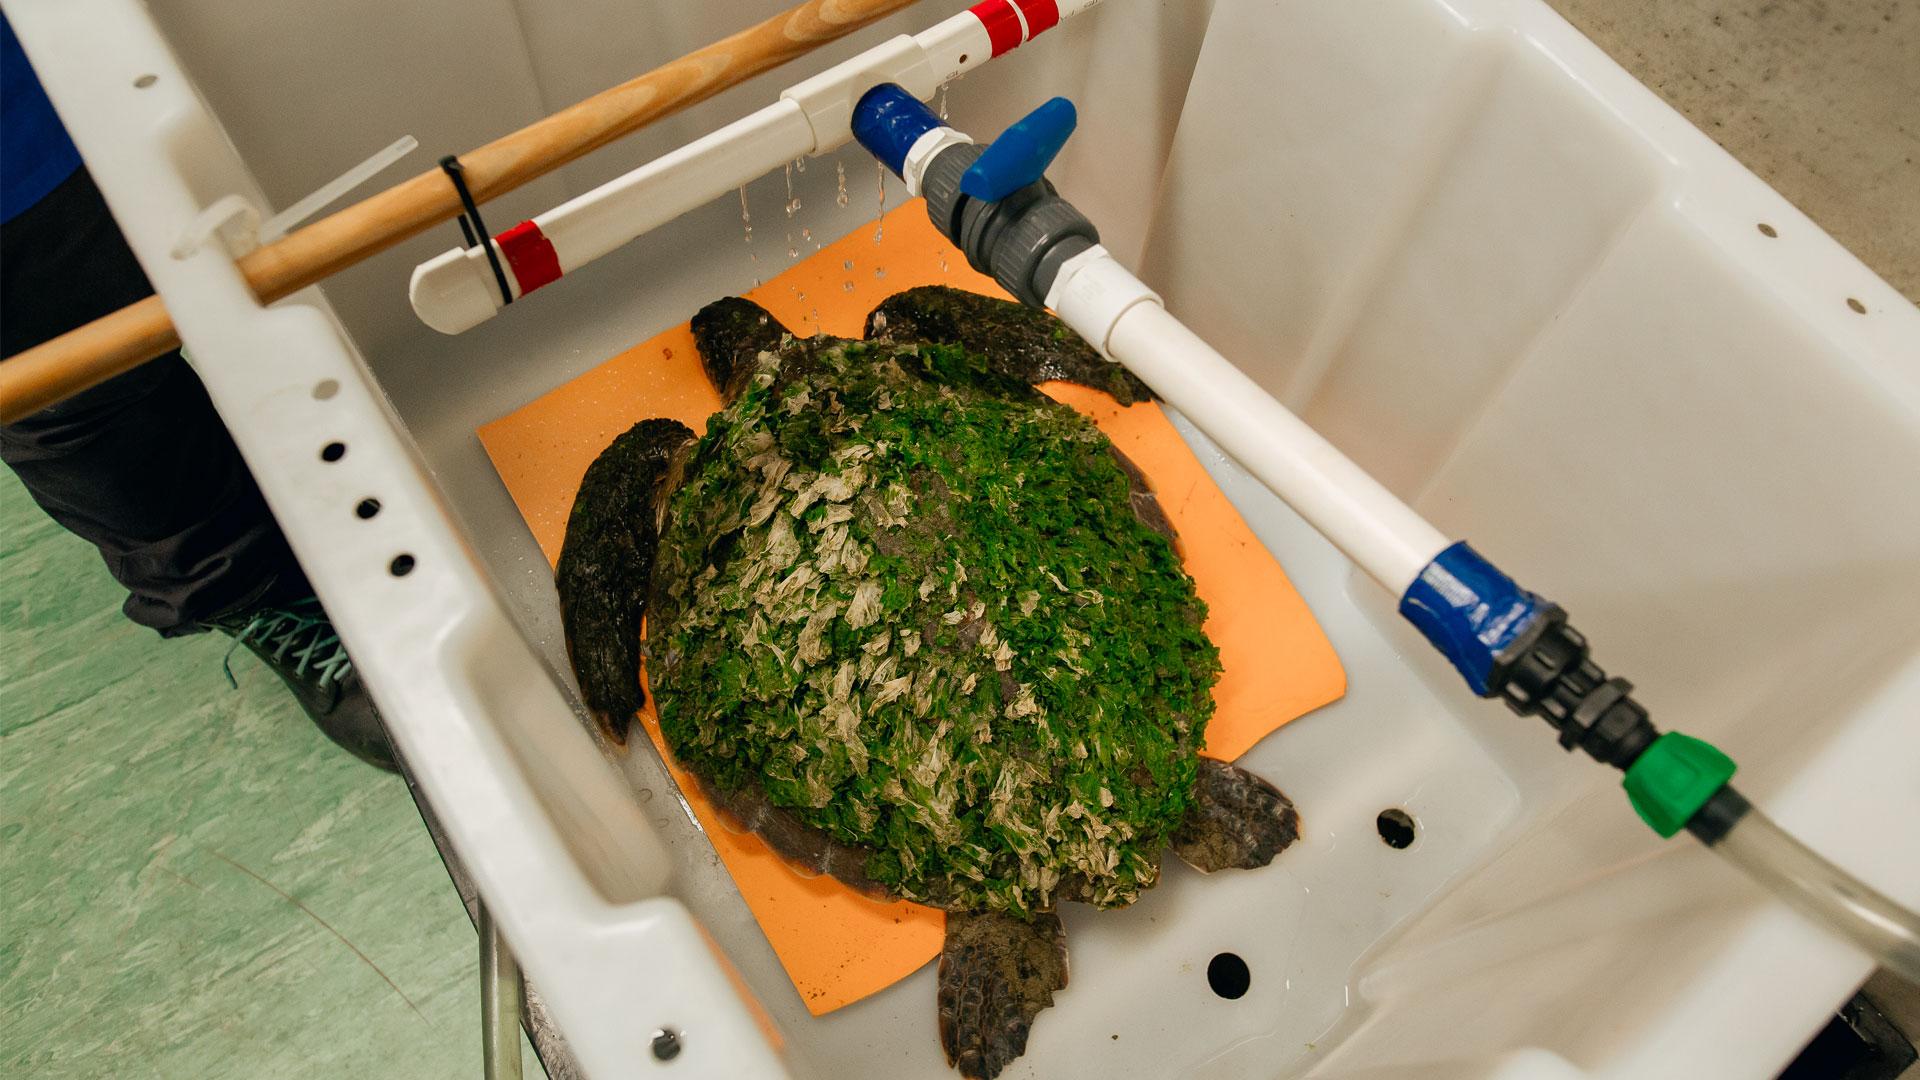 https://rfacdn.nz/zoo/assets/media/green-sea-turtle-an-gallery-6.jpg